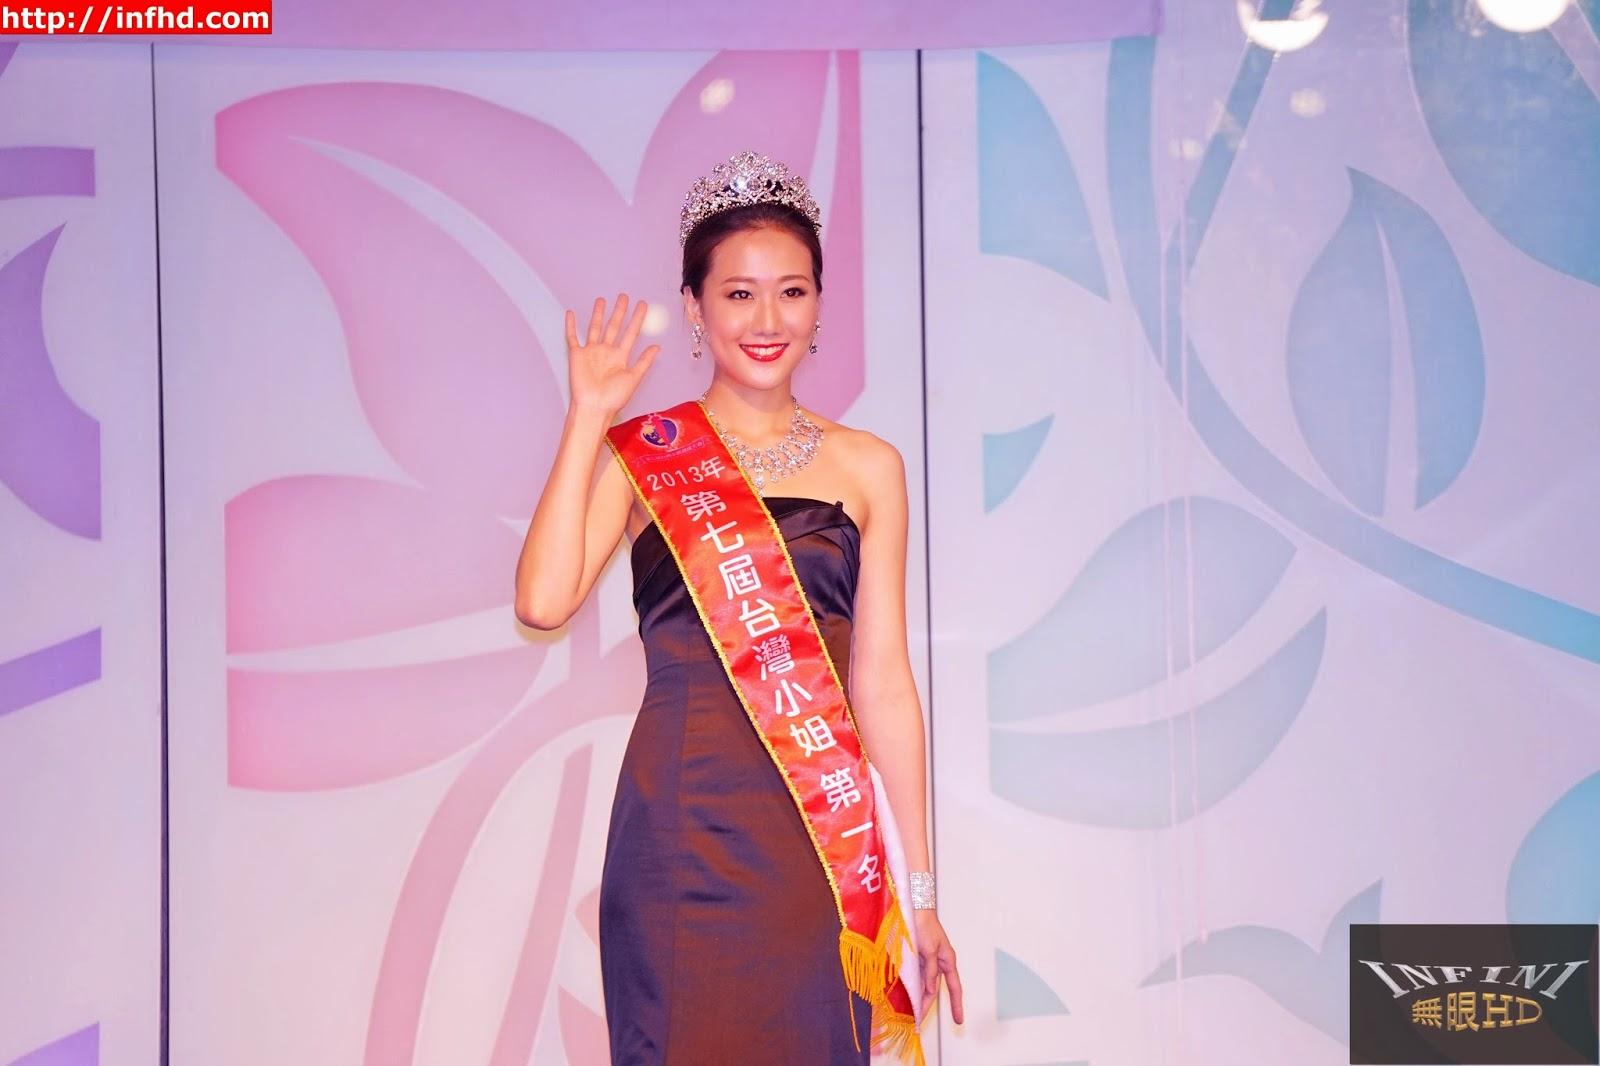 Vietnamese crowned queen of international tra | Taiwan News